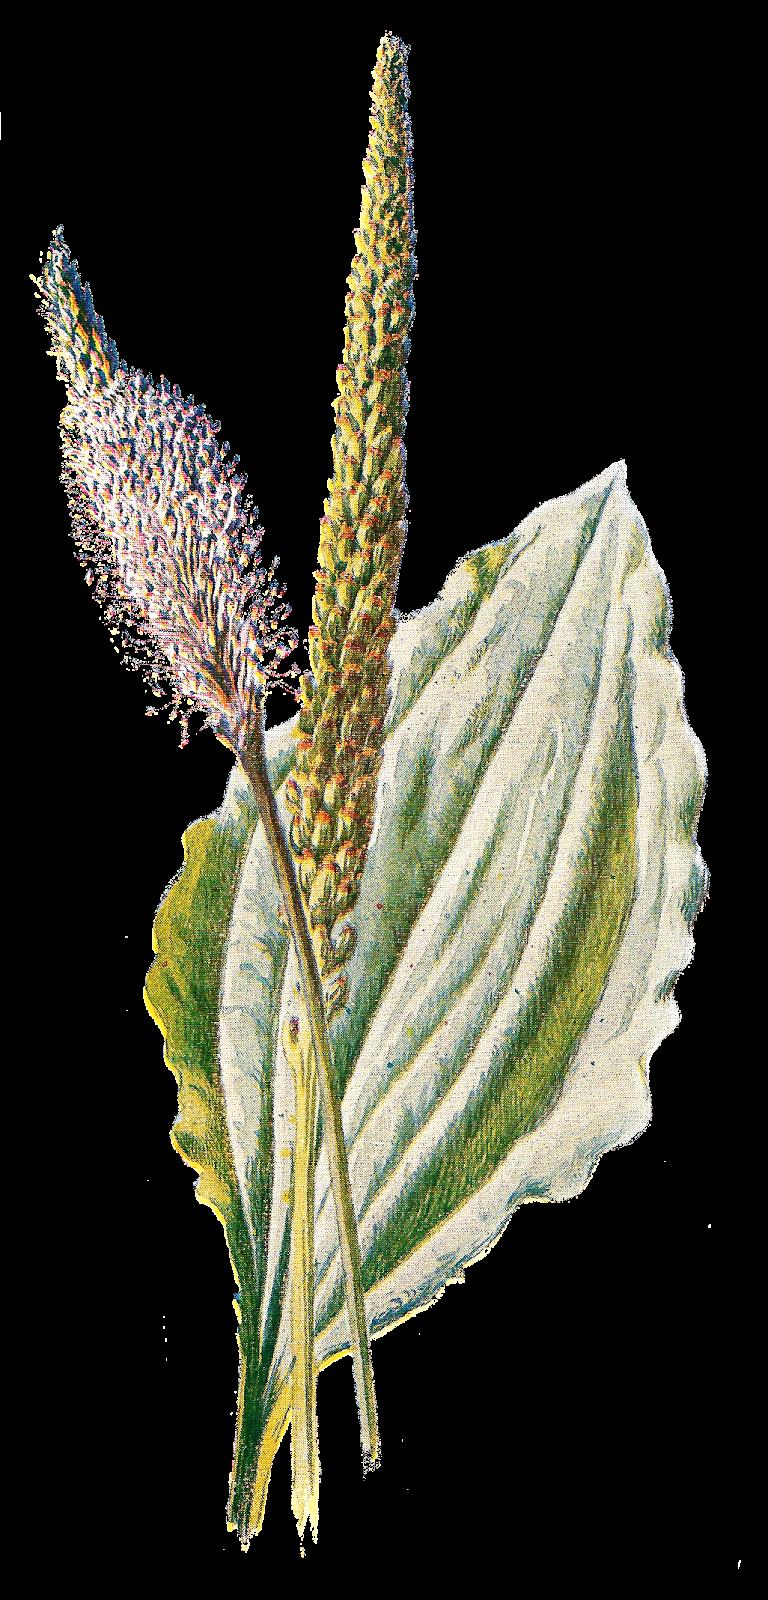 Antique Images: Free Flower Clip Art: Digital Graphic of.